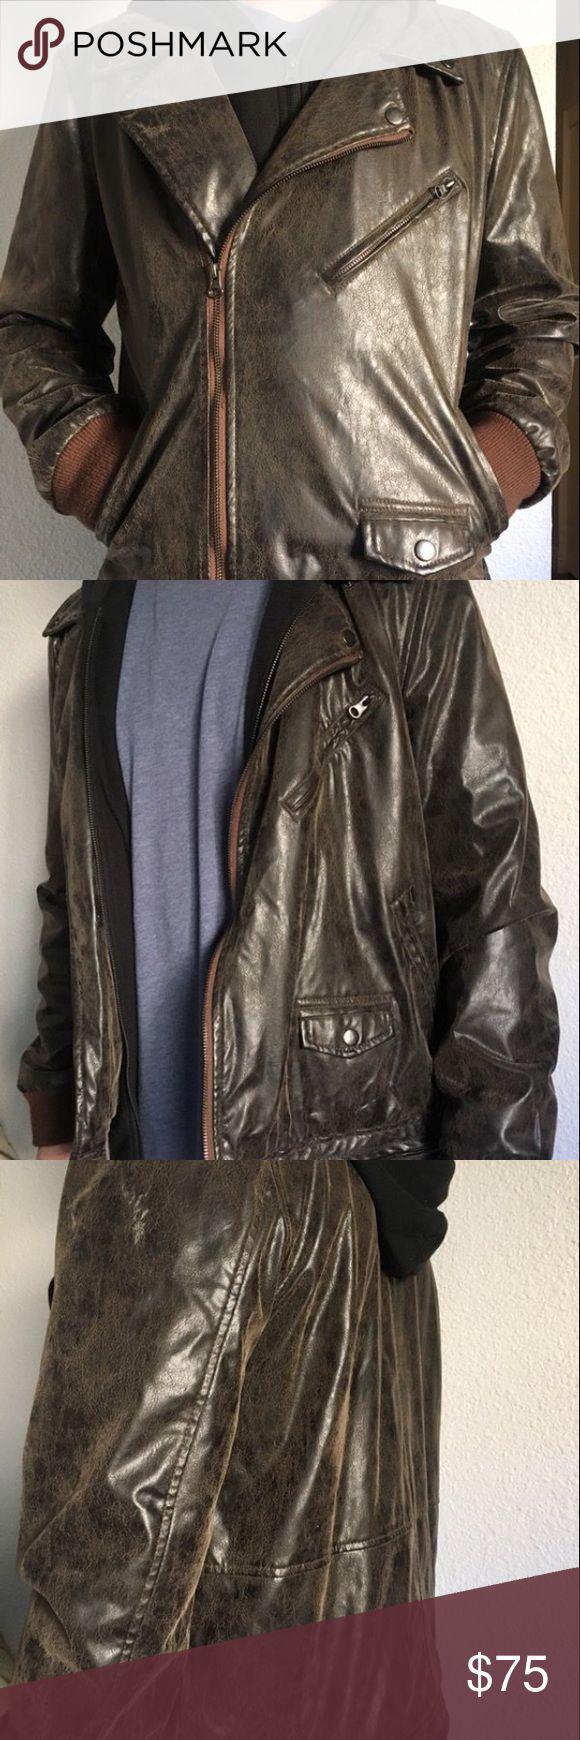 Obey Men's XL Dark Brown Leather Jacket w/Hoodie Obey Propaganda  Men's Dark Brown Faux Leather Jacket with Hoodie  Never worn Obey Jackets & Coats Bomber & Varsity